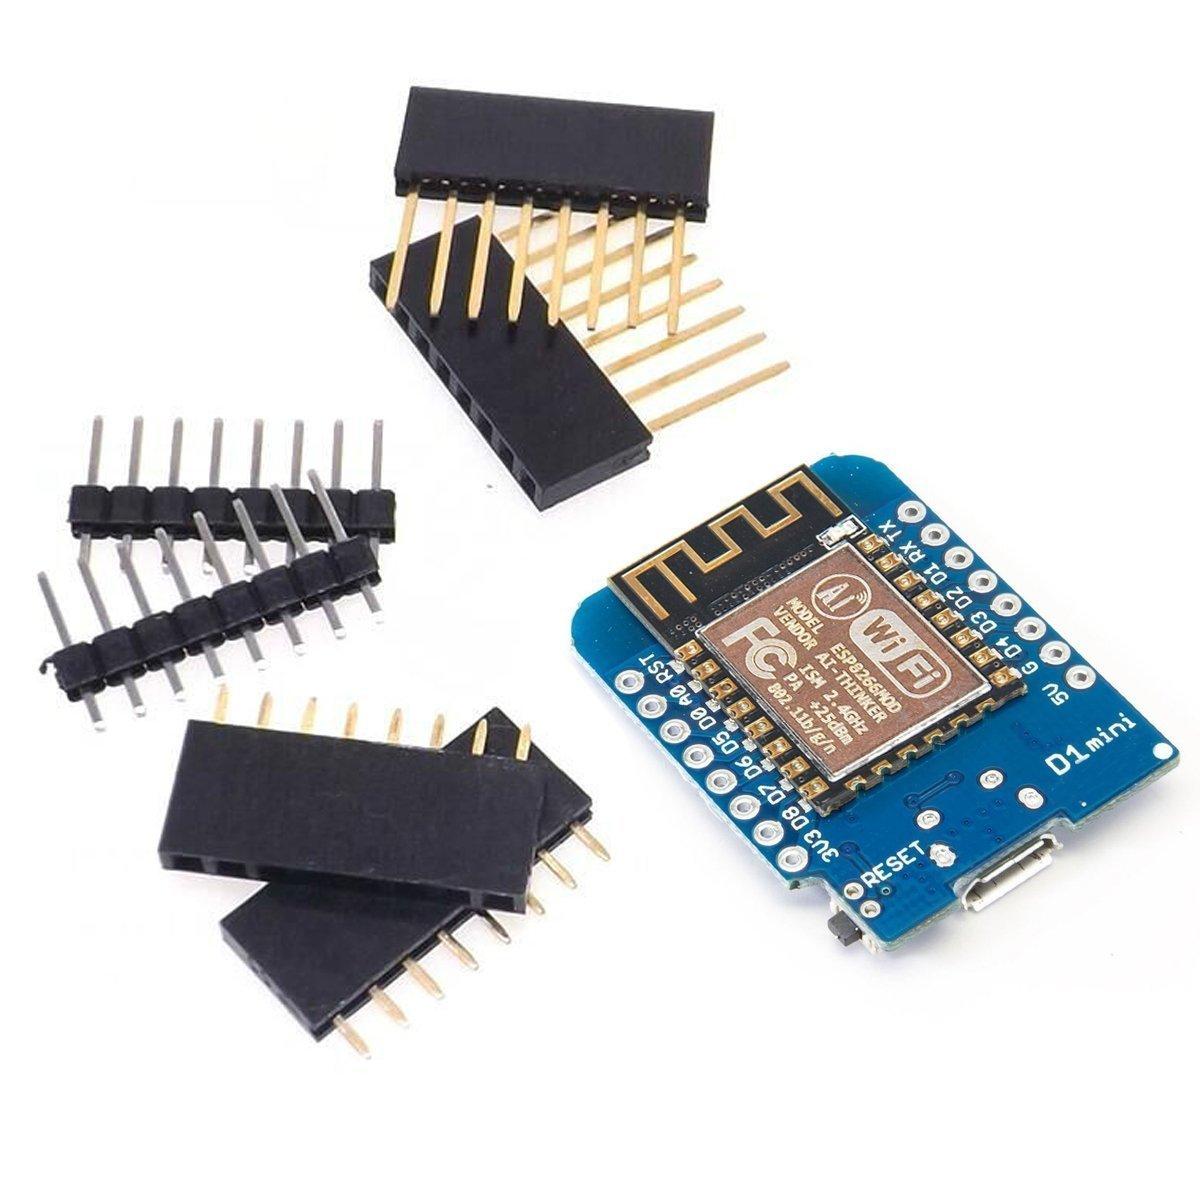 placa dezvoltare esp12 mini v2